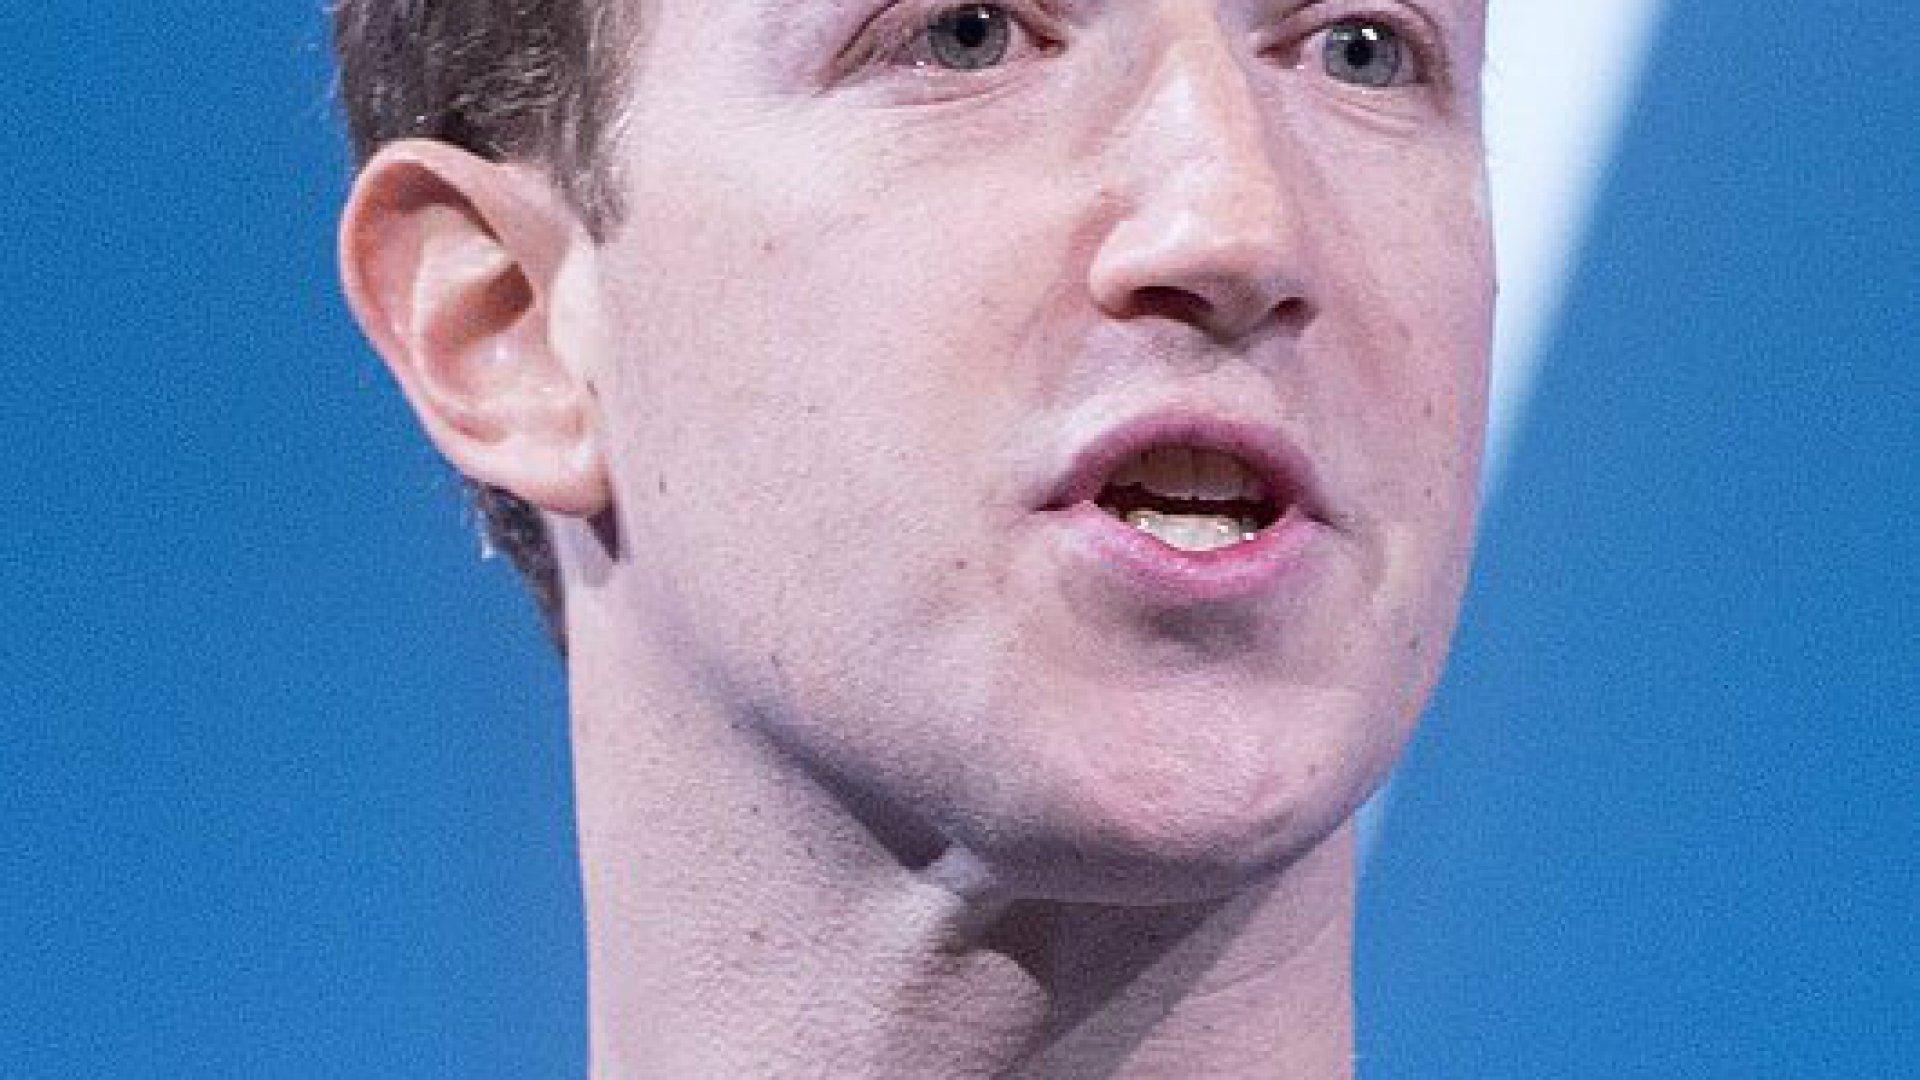 Anthony Quintano from Honolulu, HI, United States - Mark Zuckerberg F8 2018 Keynote